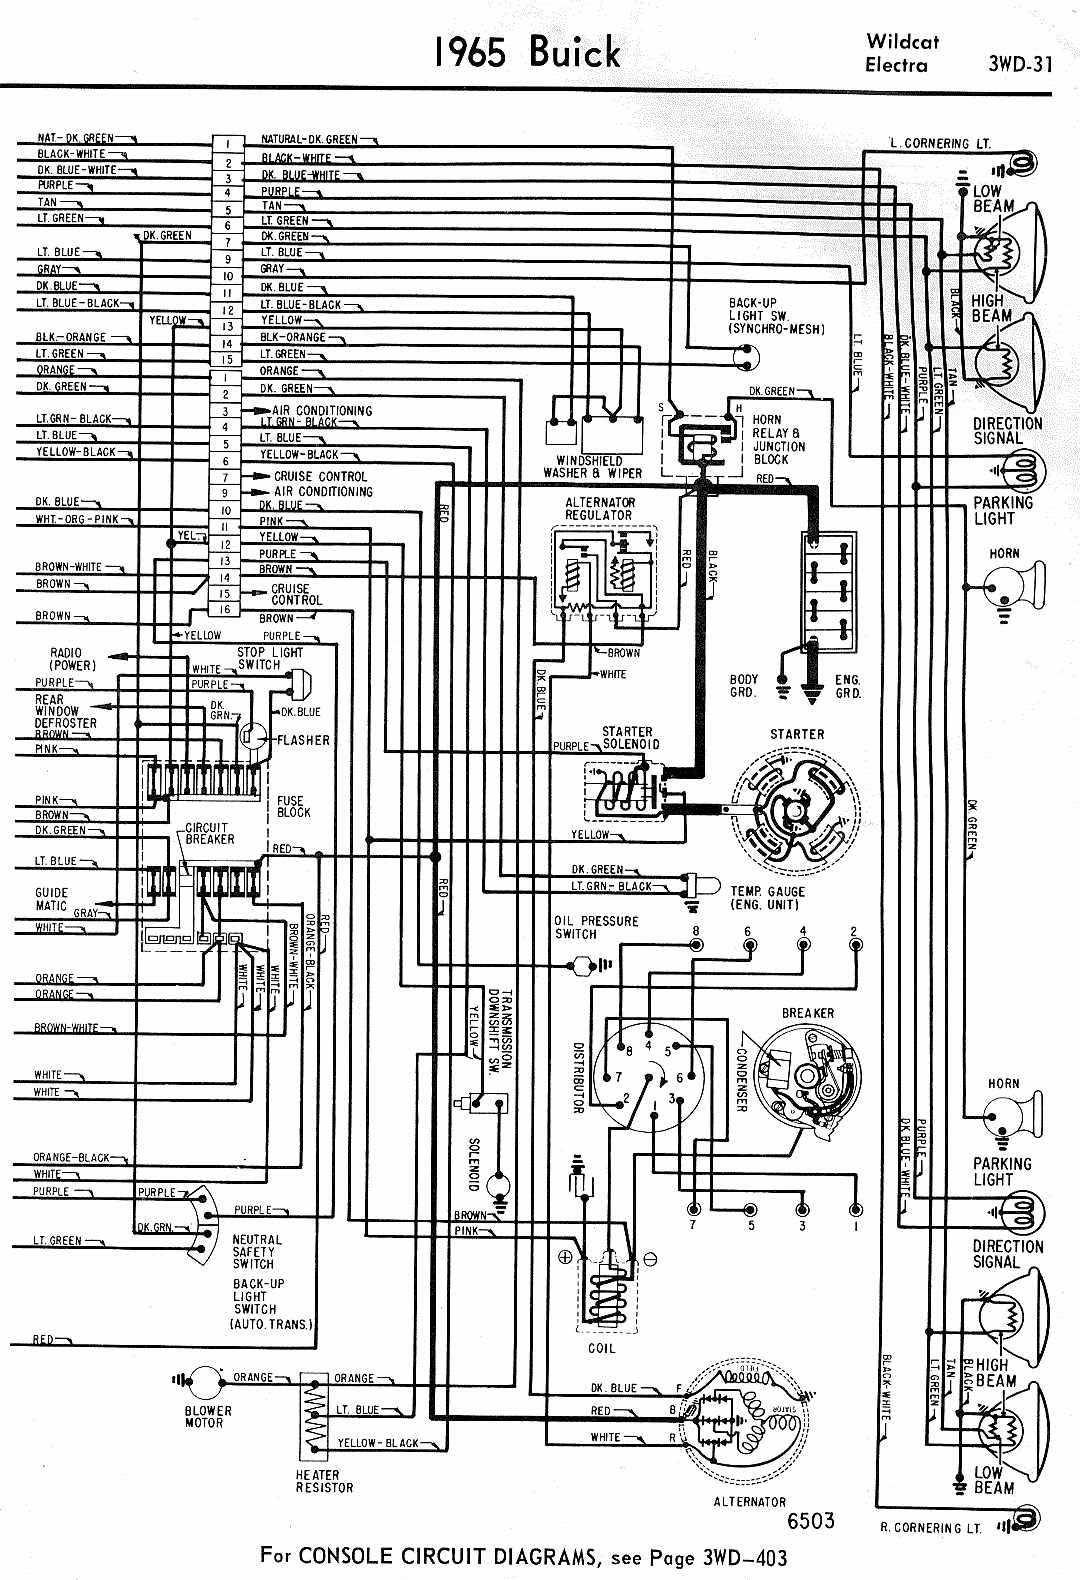 1940 oldsmobile wiring schematic wiring diagrams rh 33 vesterbro de 1967 oldsmobile cutlass wiring diagrams oldsmobile [ 1080 x 1580 Pixel ]